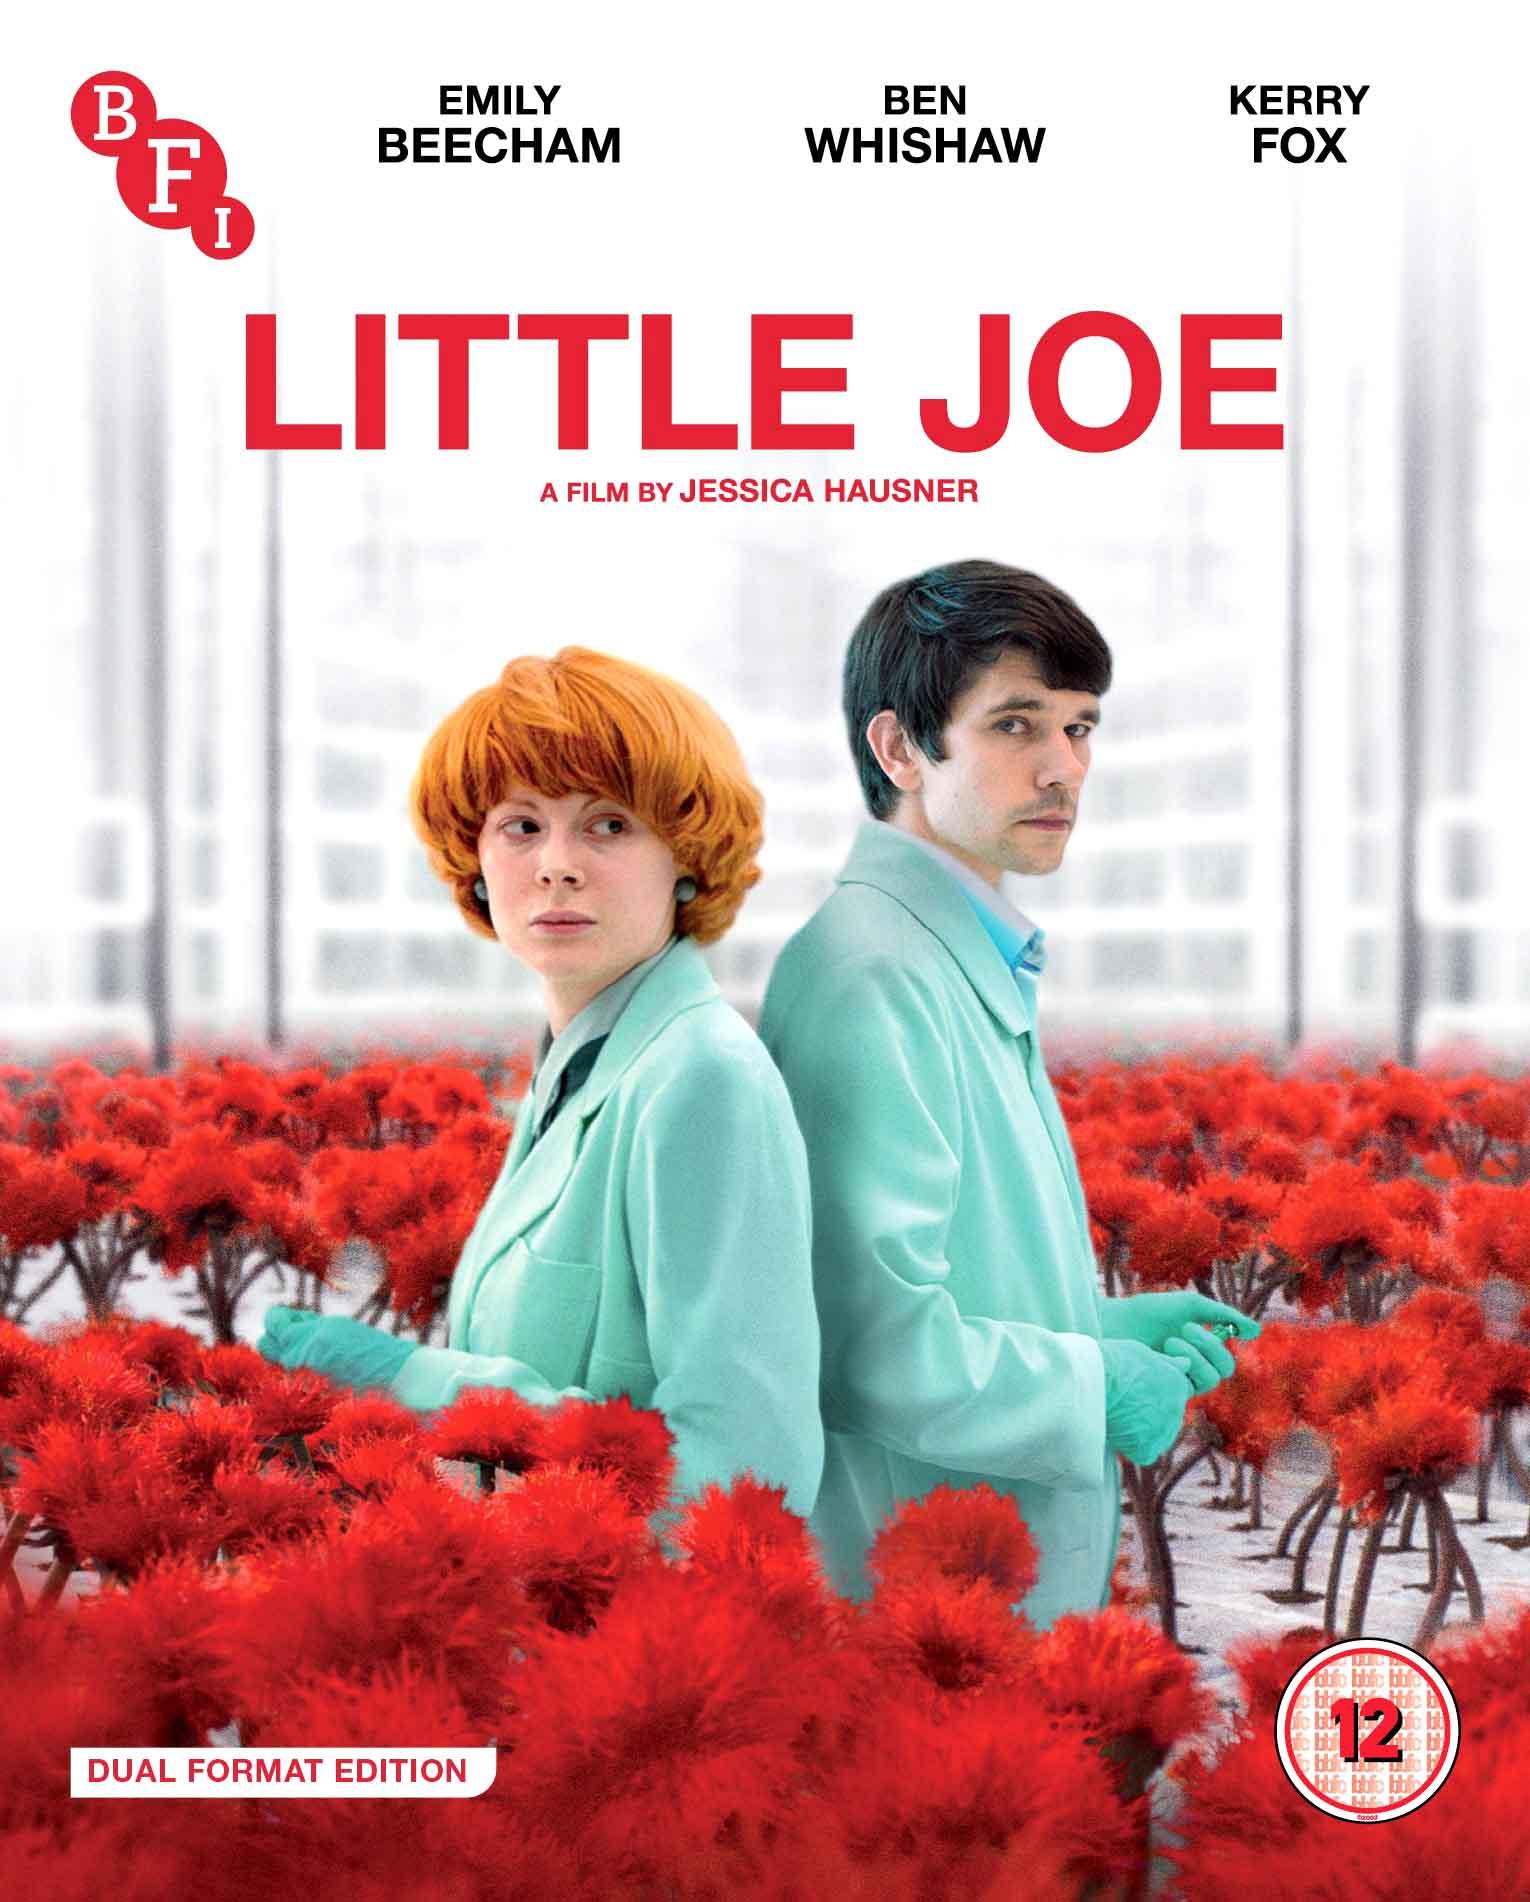 Buy PRE-ORDER Little Joe (Dual Format Edition)